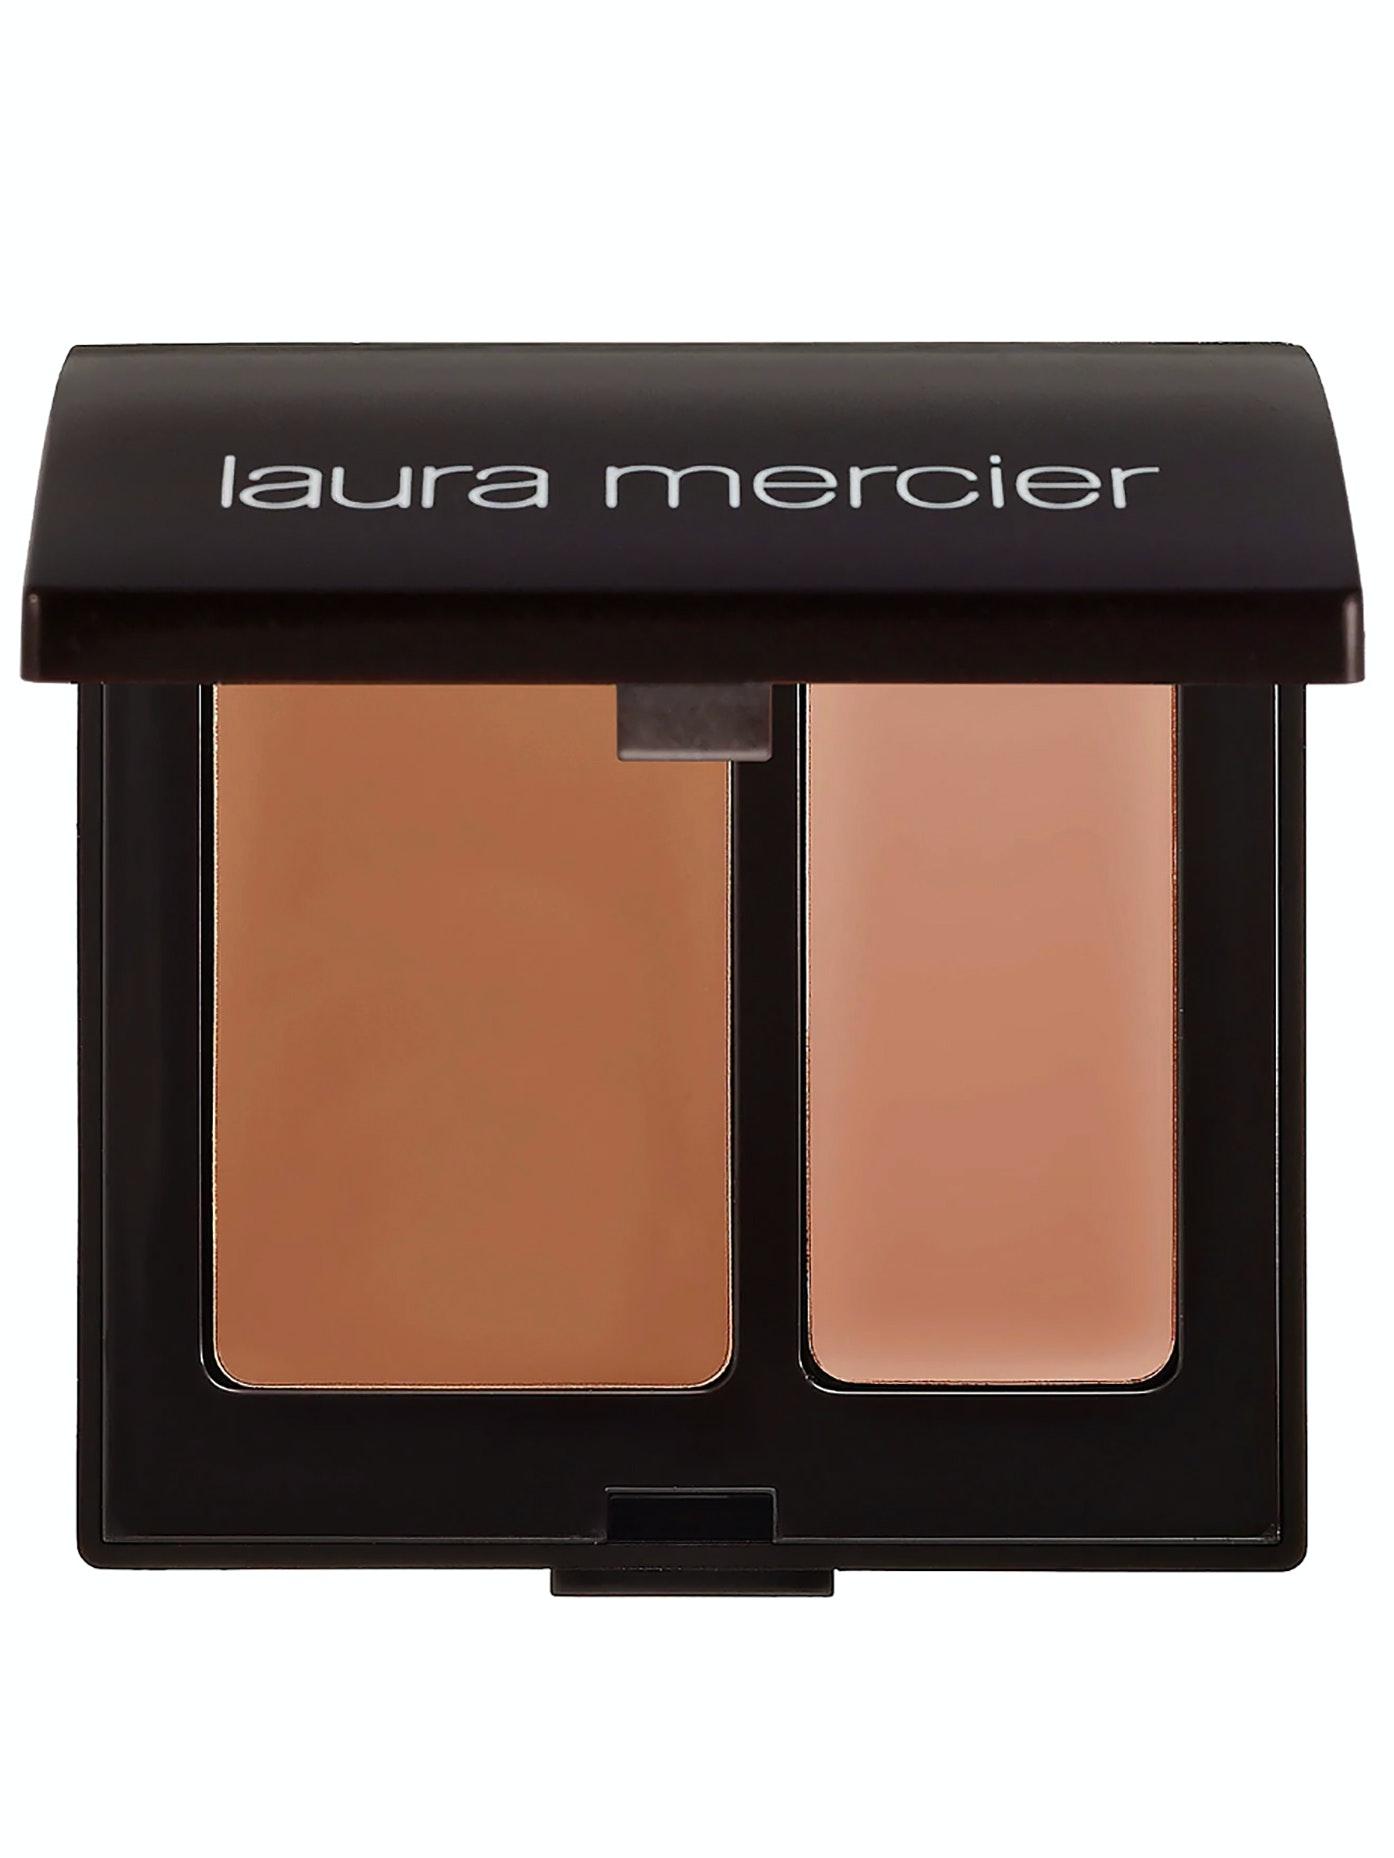 Laura Mercier Secret Camouflage Concealer